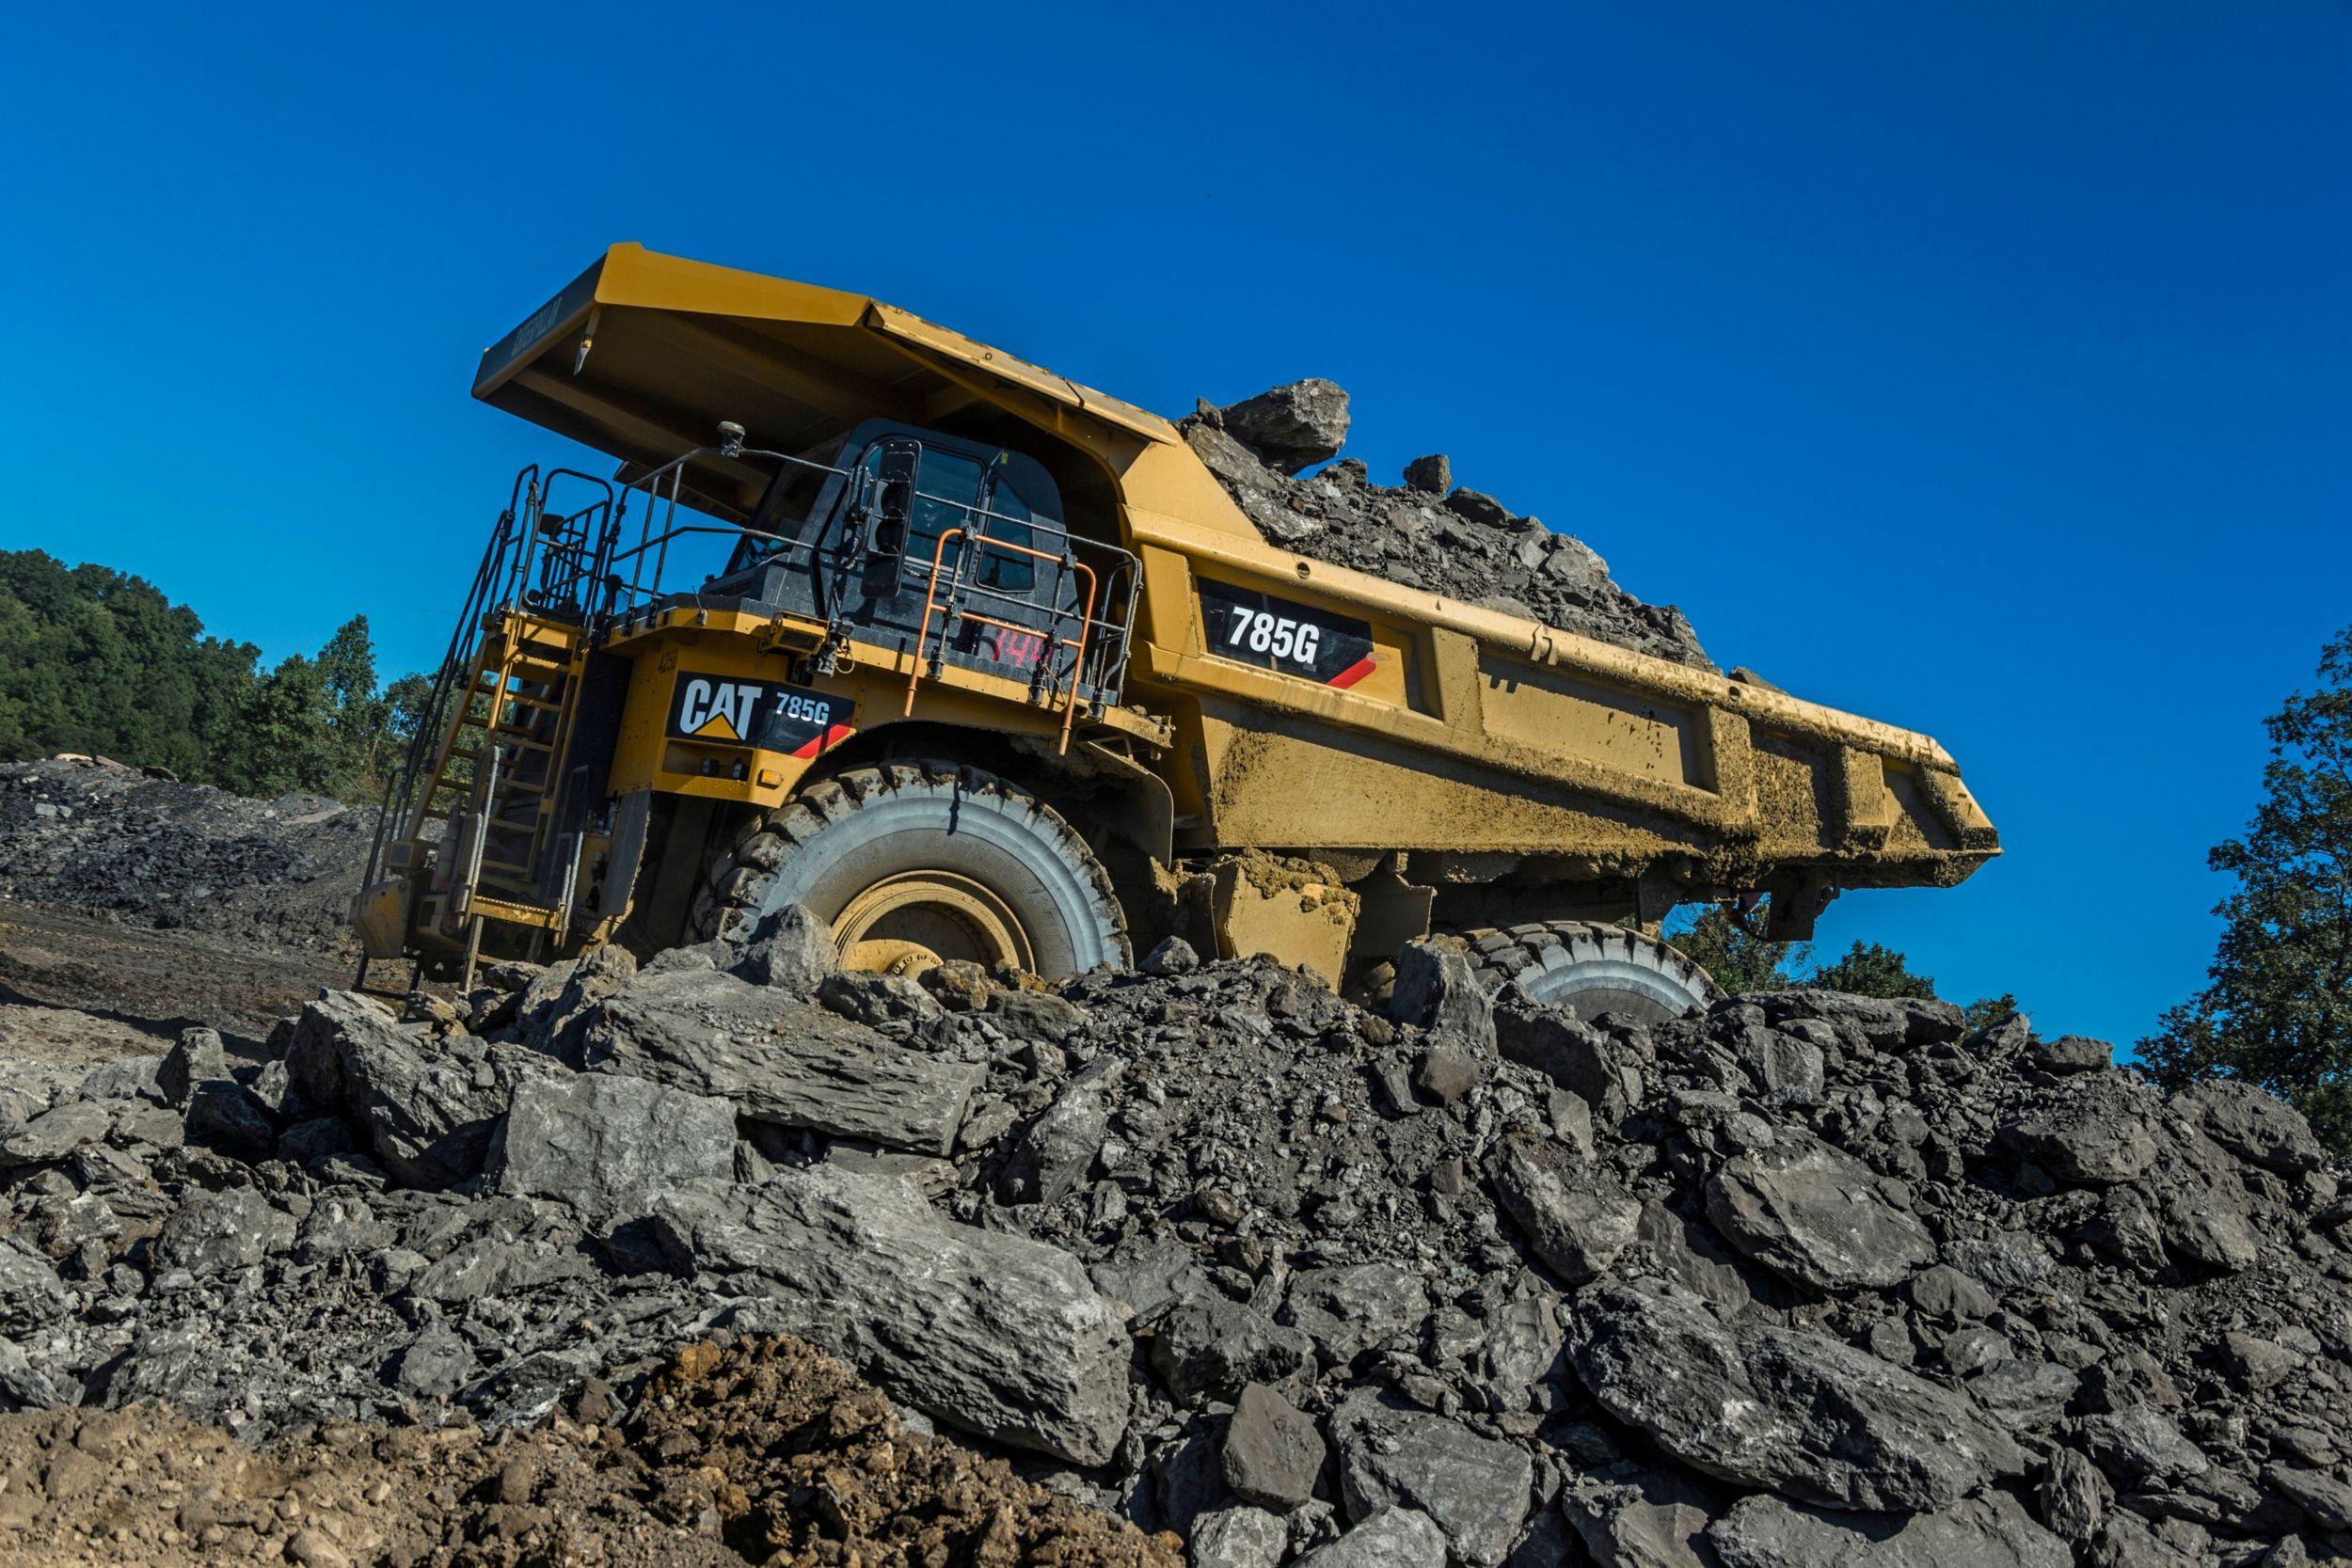 785G Mining Truck>